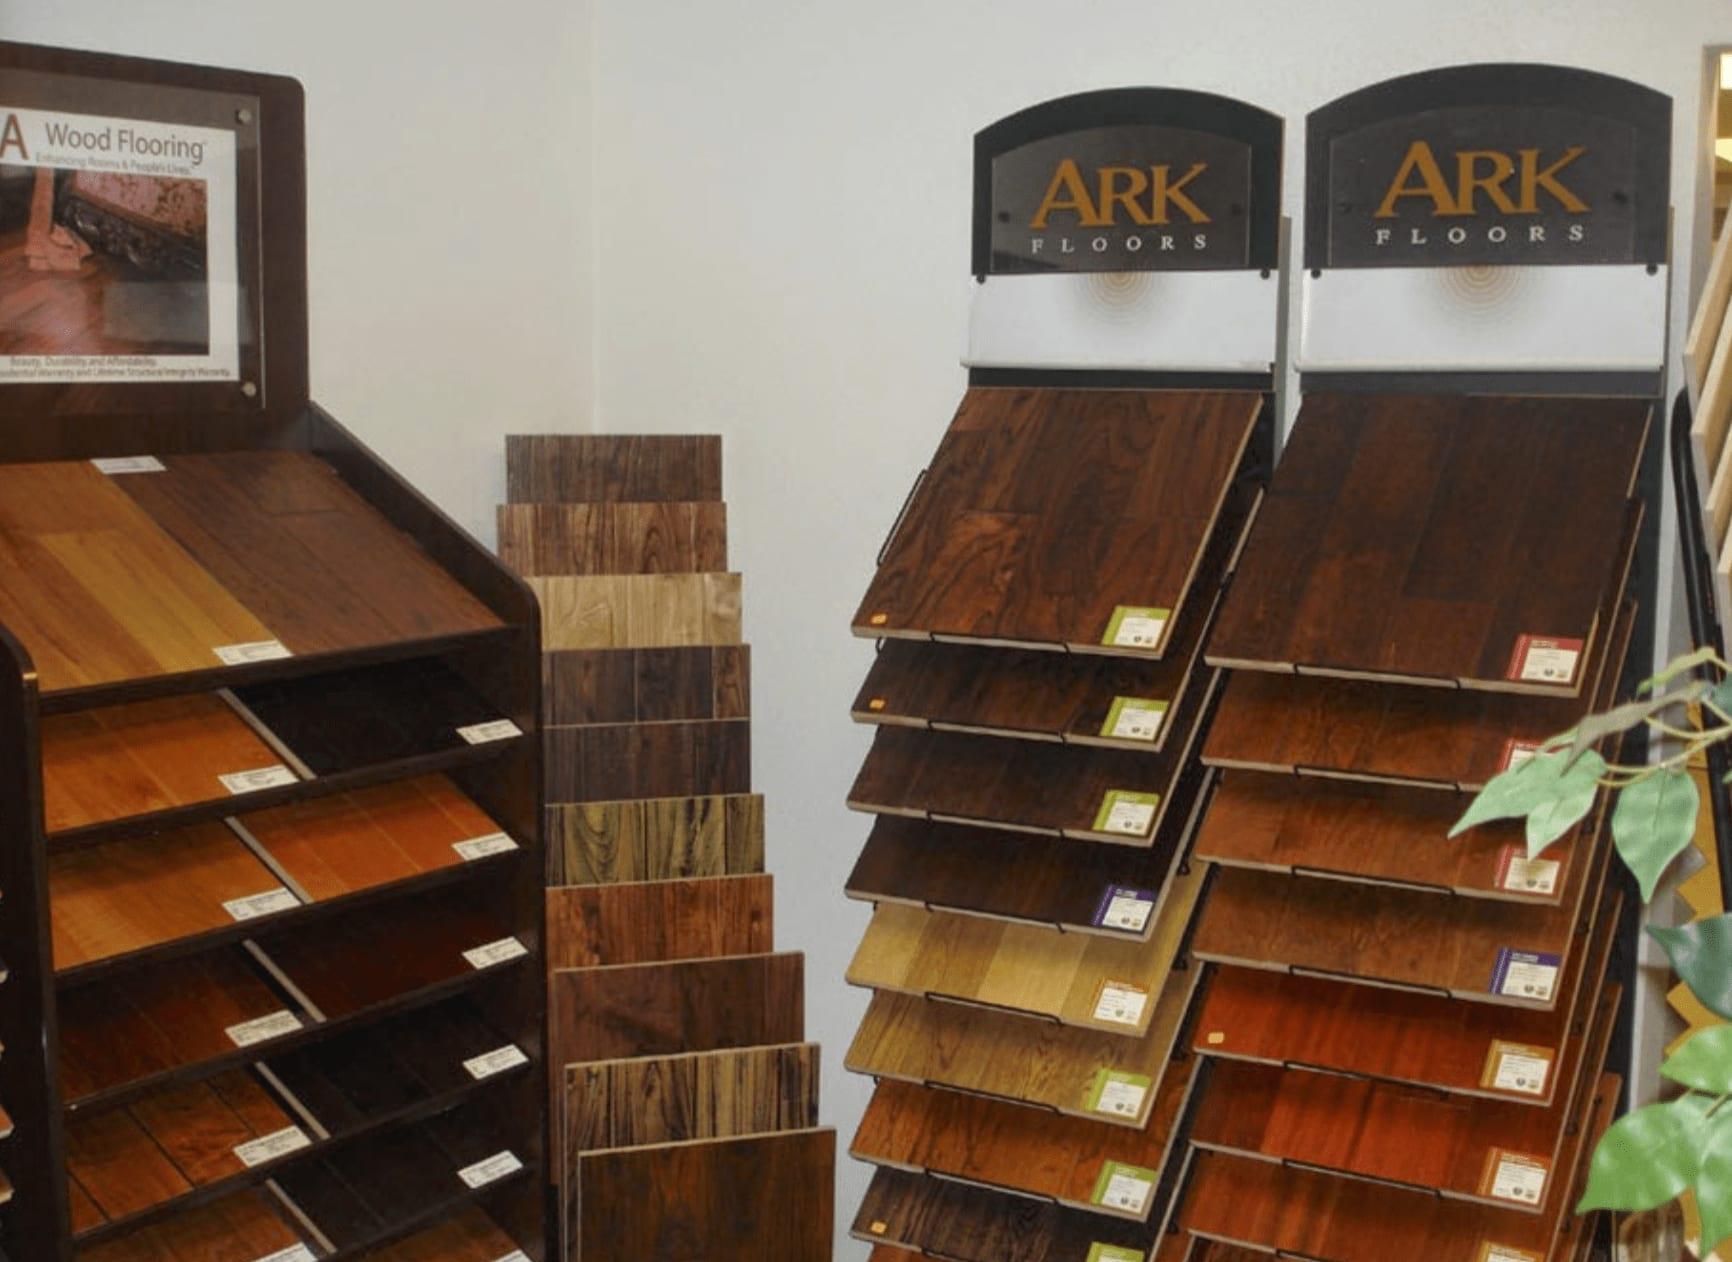 Ark Floors for your Irvine, CA home from 55 Flooring